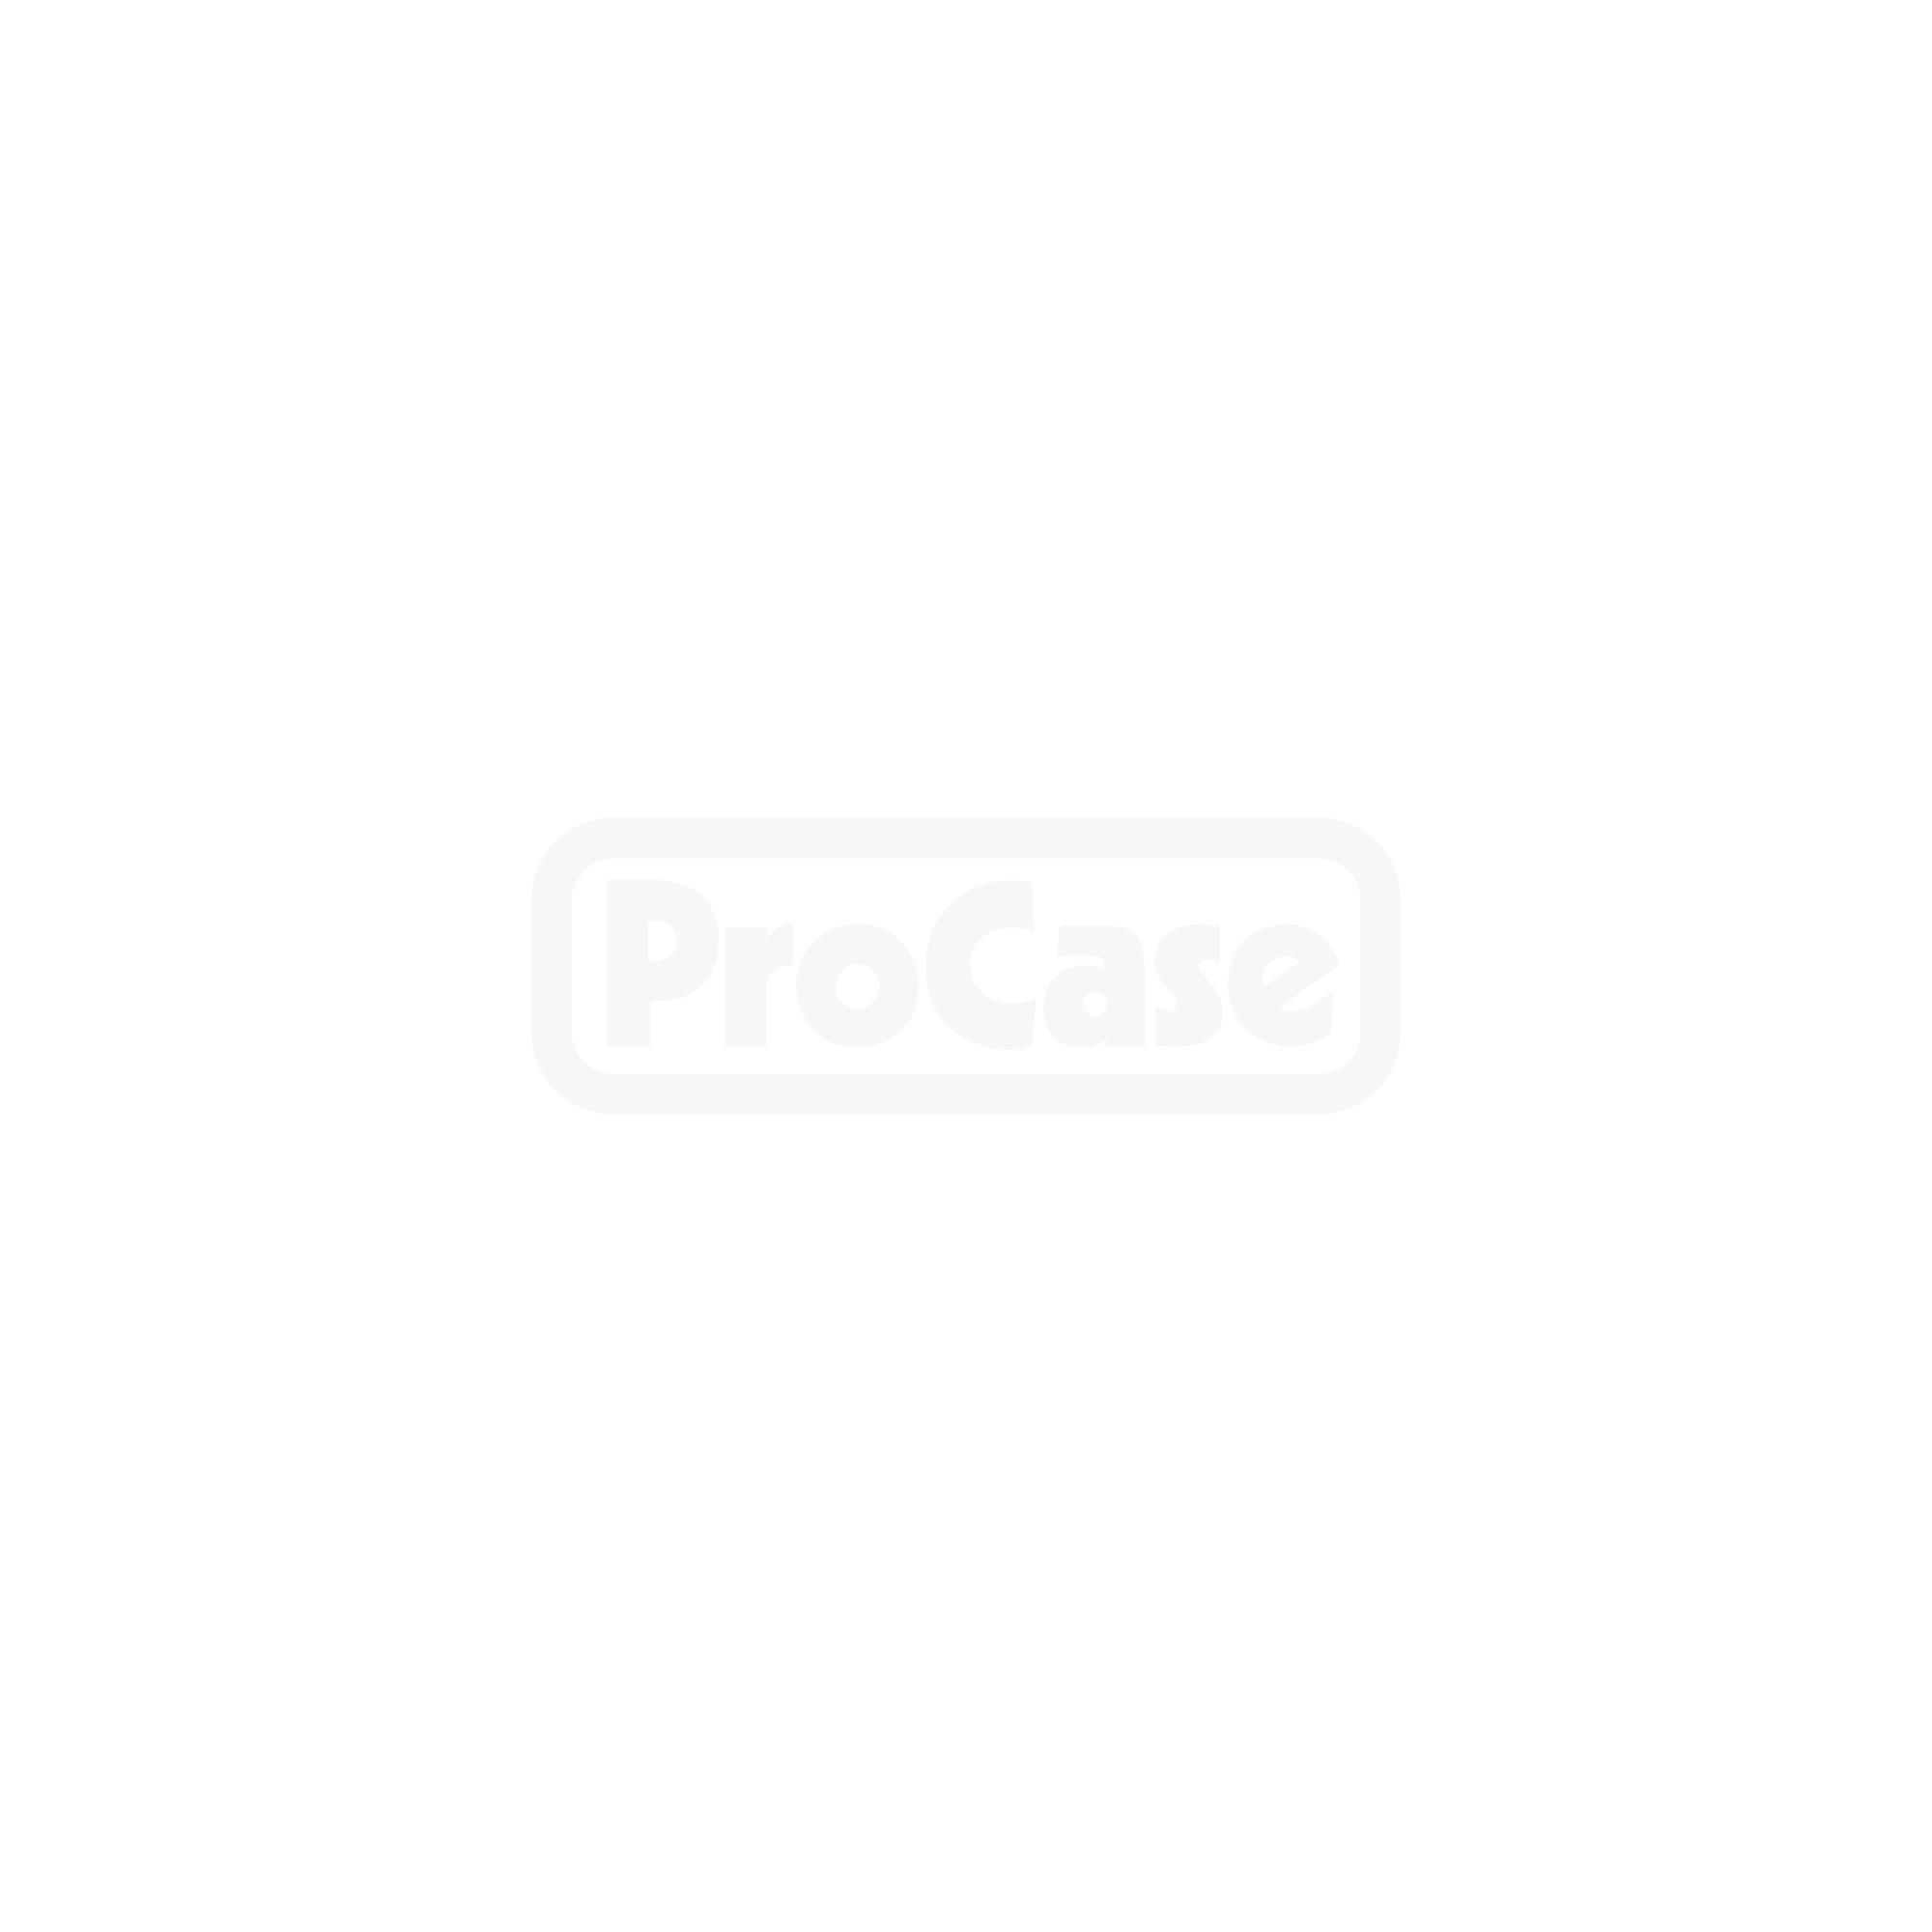 Koffer für 5 Intel Convertible Classmate-PC